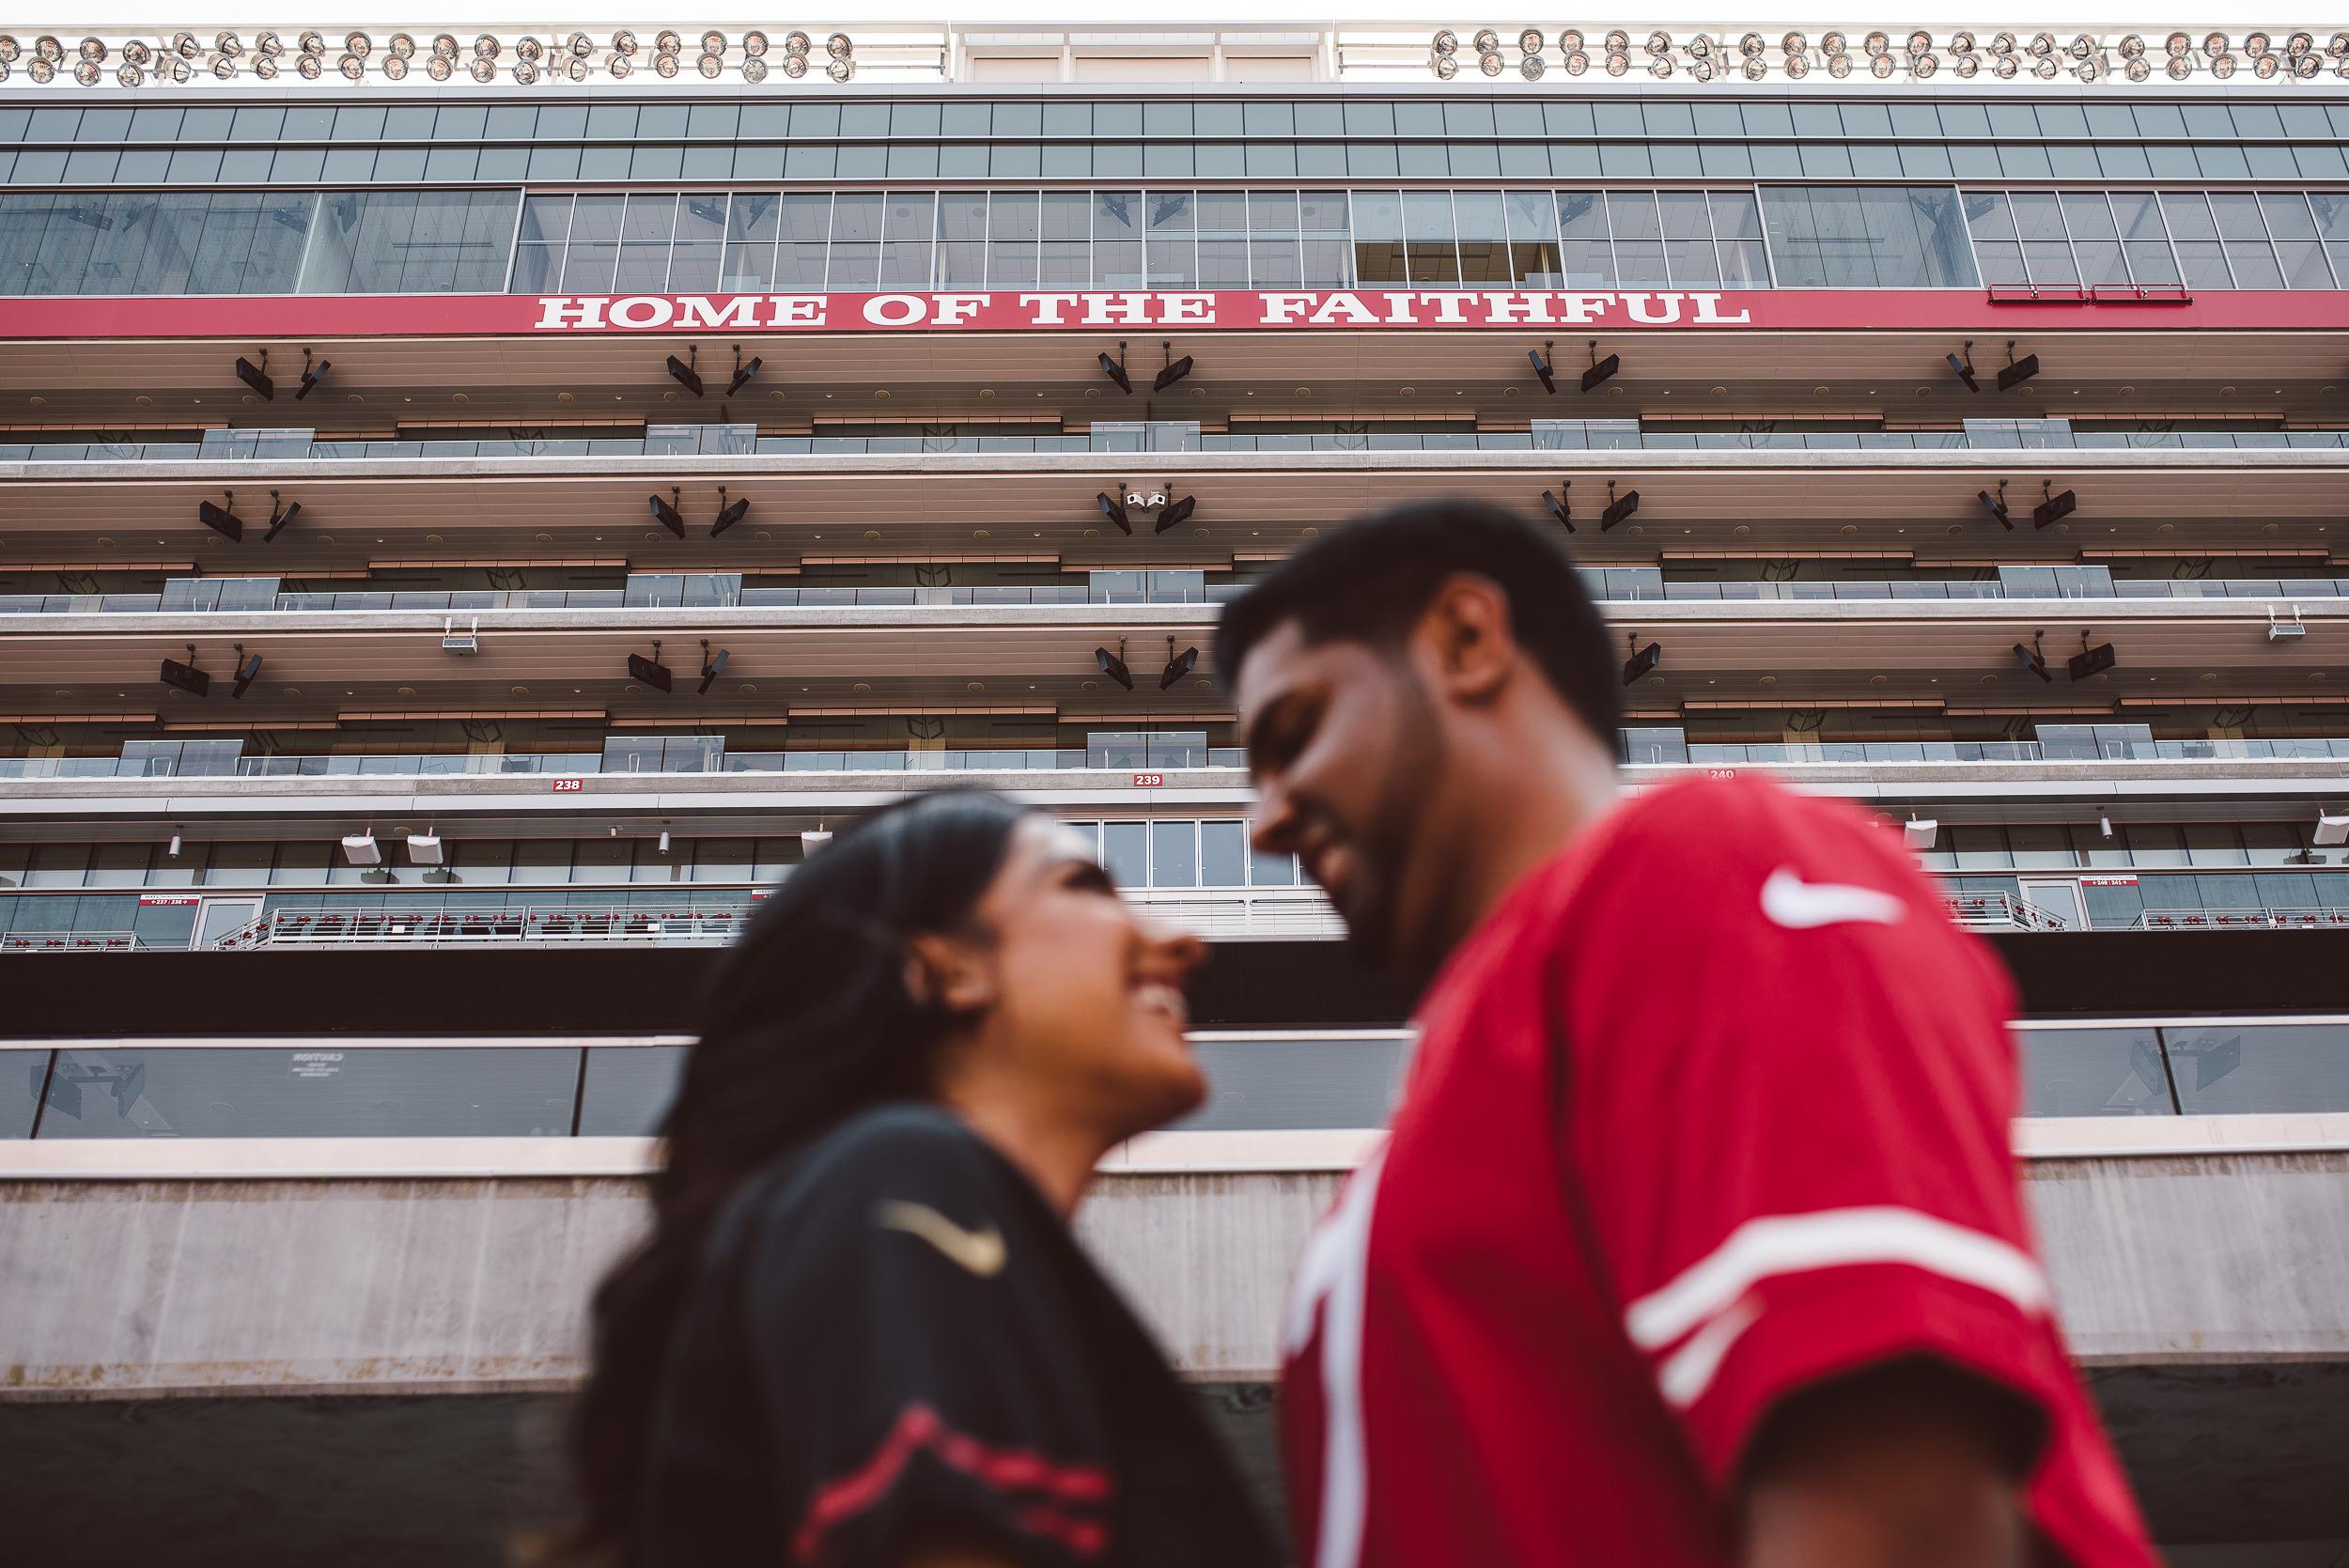 San-Francisco-49ers-Levis-Stadium-Engagement-Photography-018.jpg